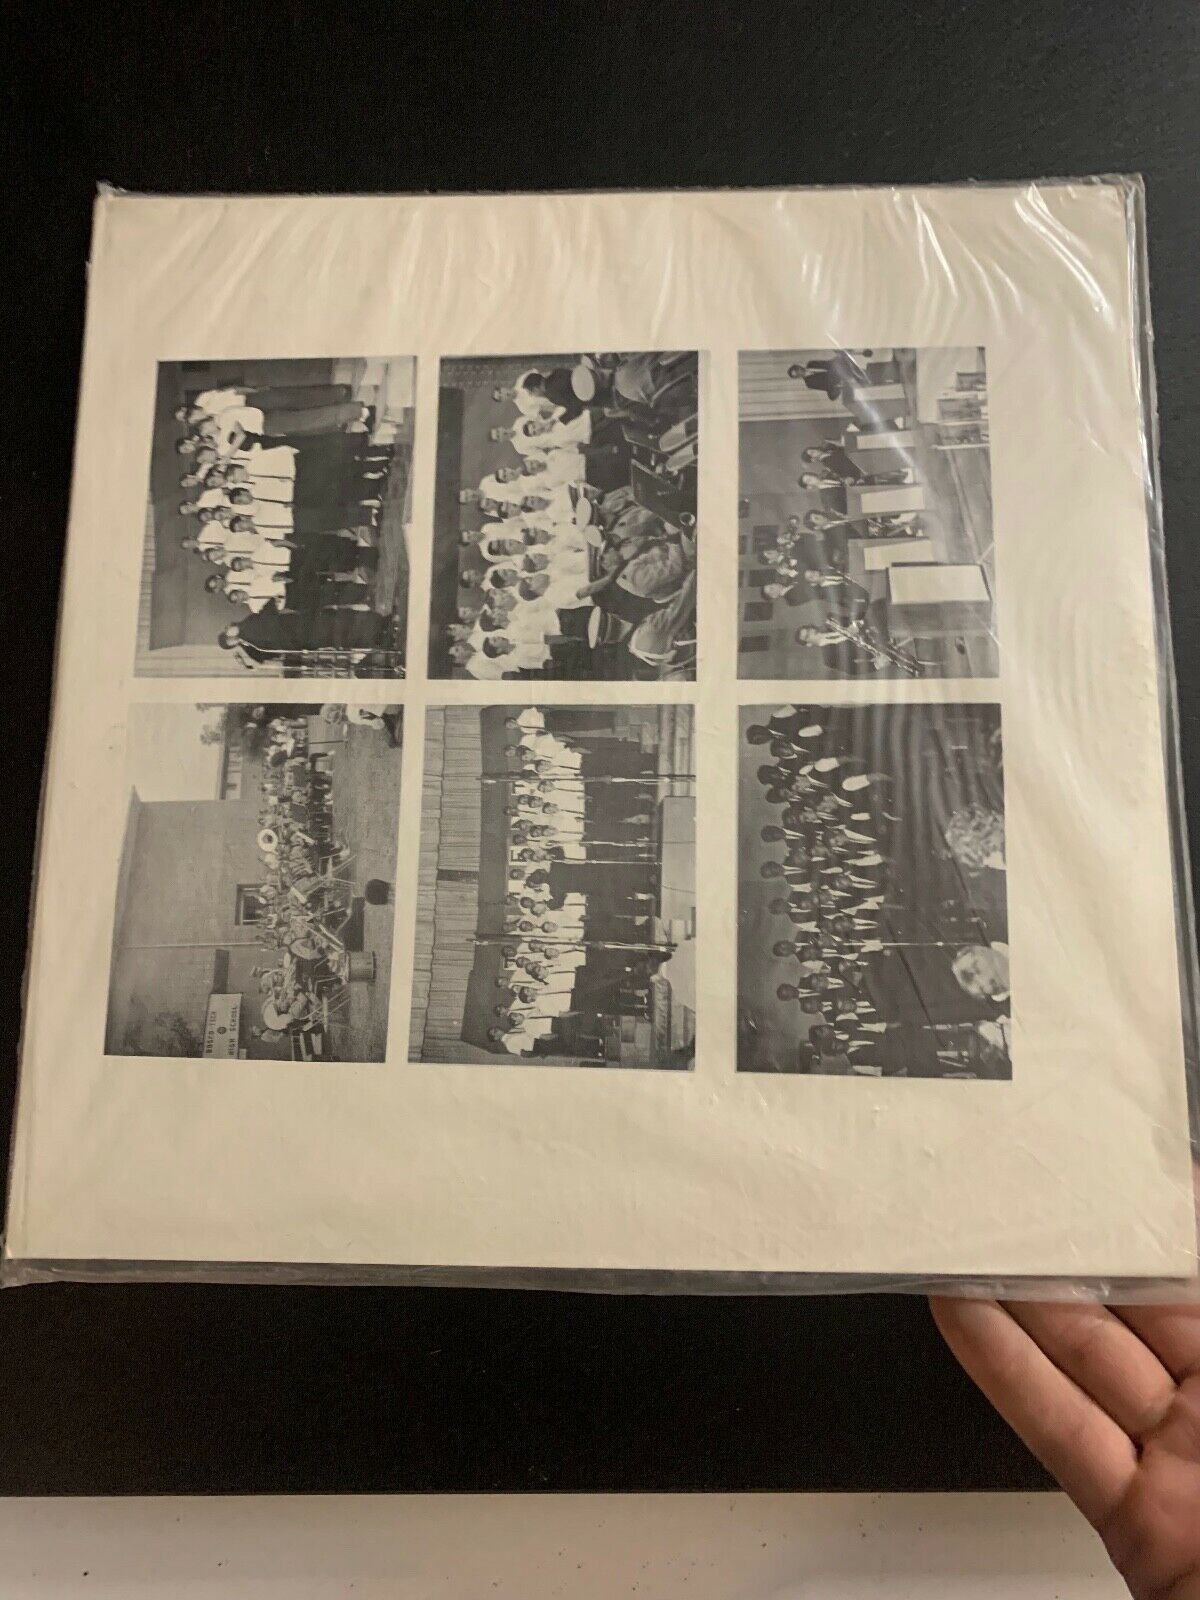 LP RECORD - 1964 MUSICAL SOUVENIRS BOSCO TECH HIGH SCHOOL CALIFORNIA UNOPENED - $9.99